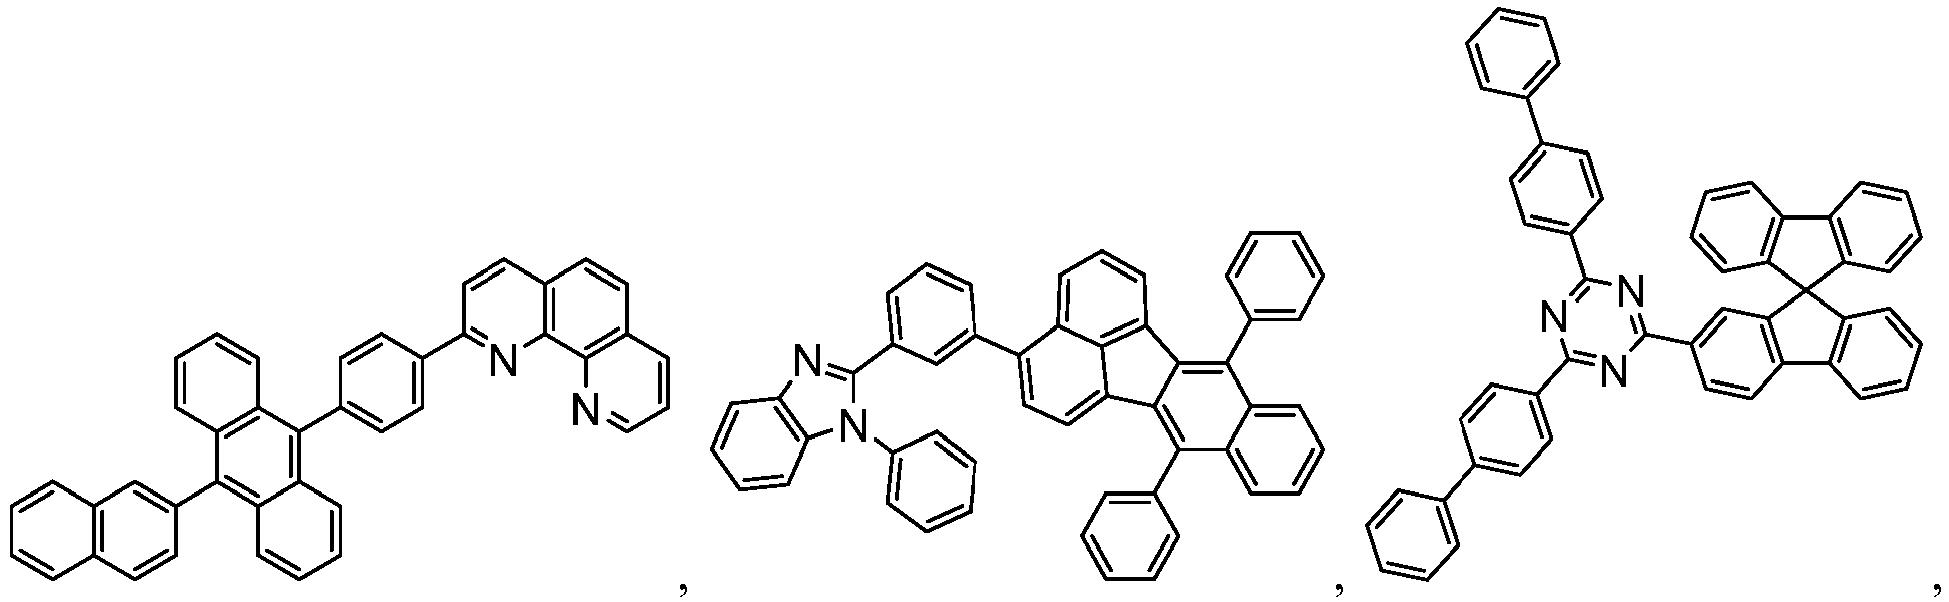 Figure imgb0949